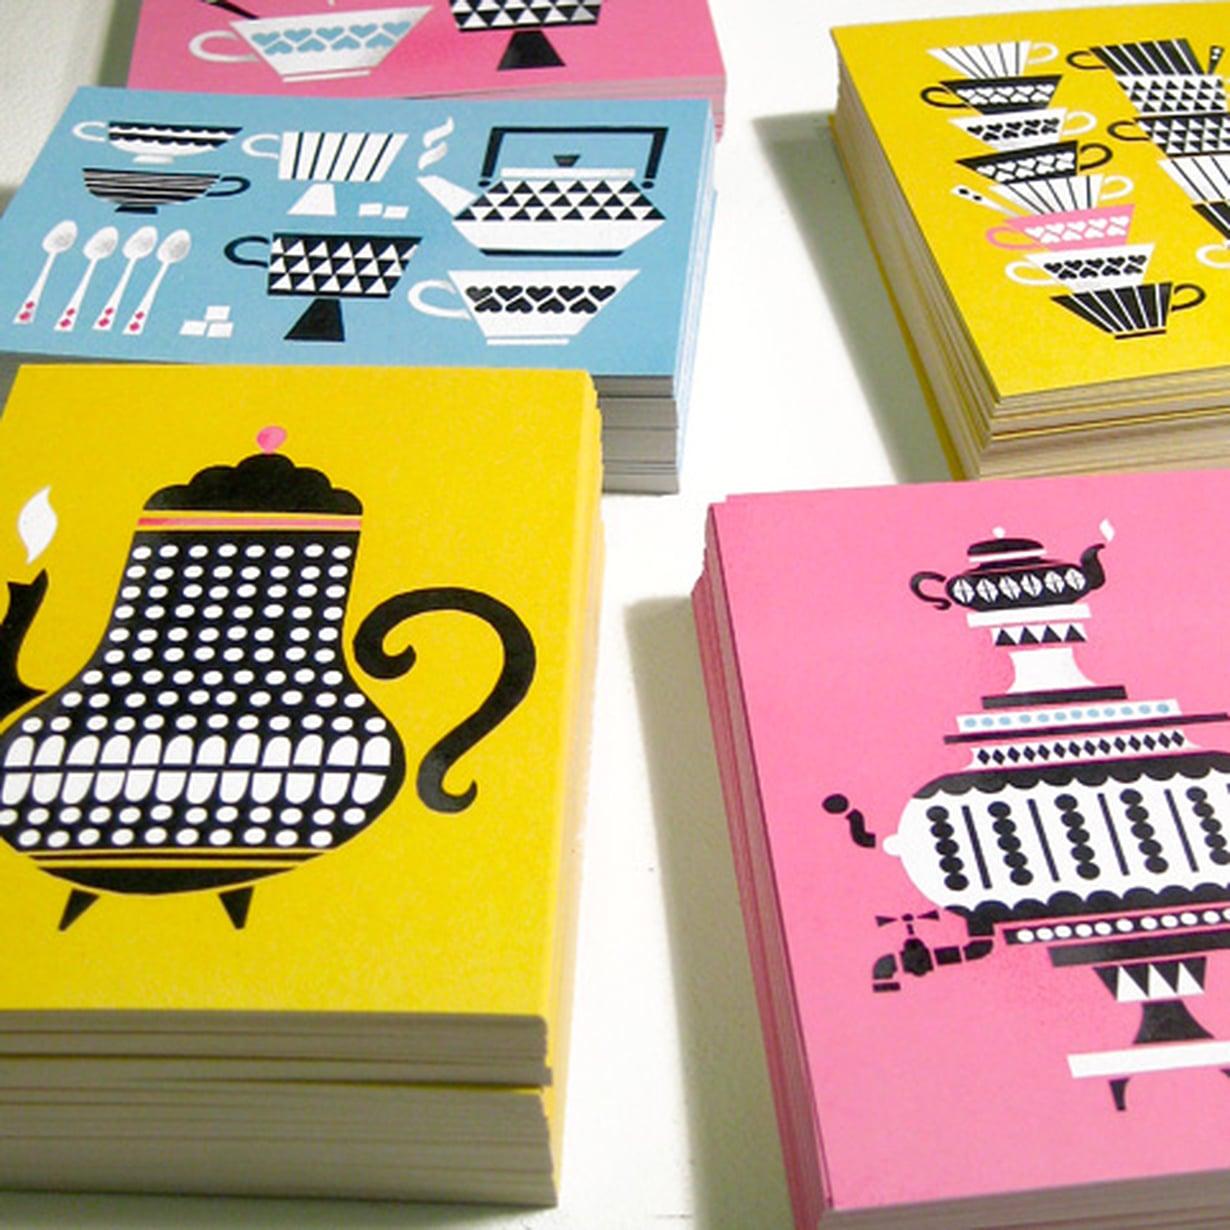 polkka_jam_cards_tsai_et_cafe2